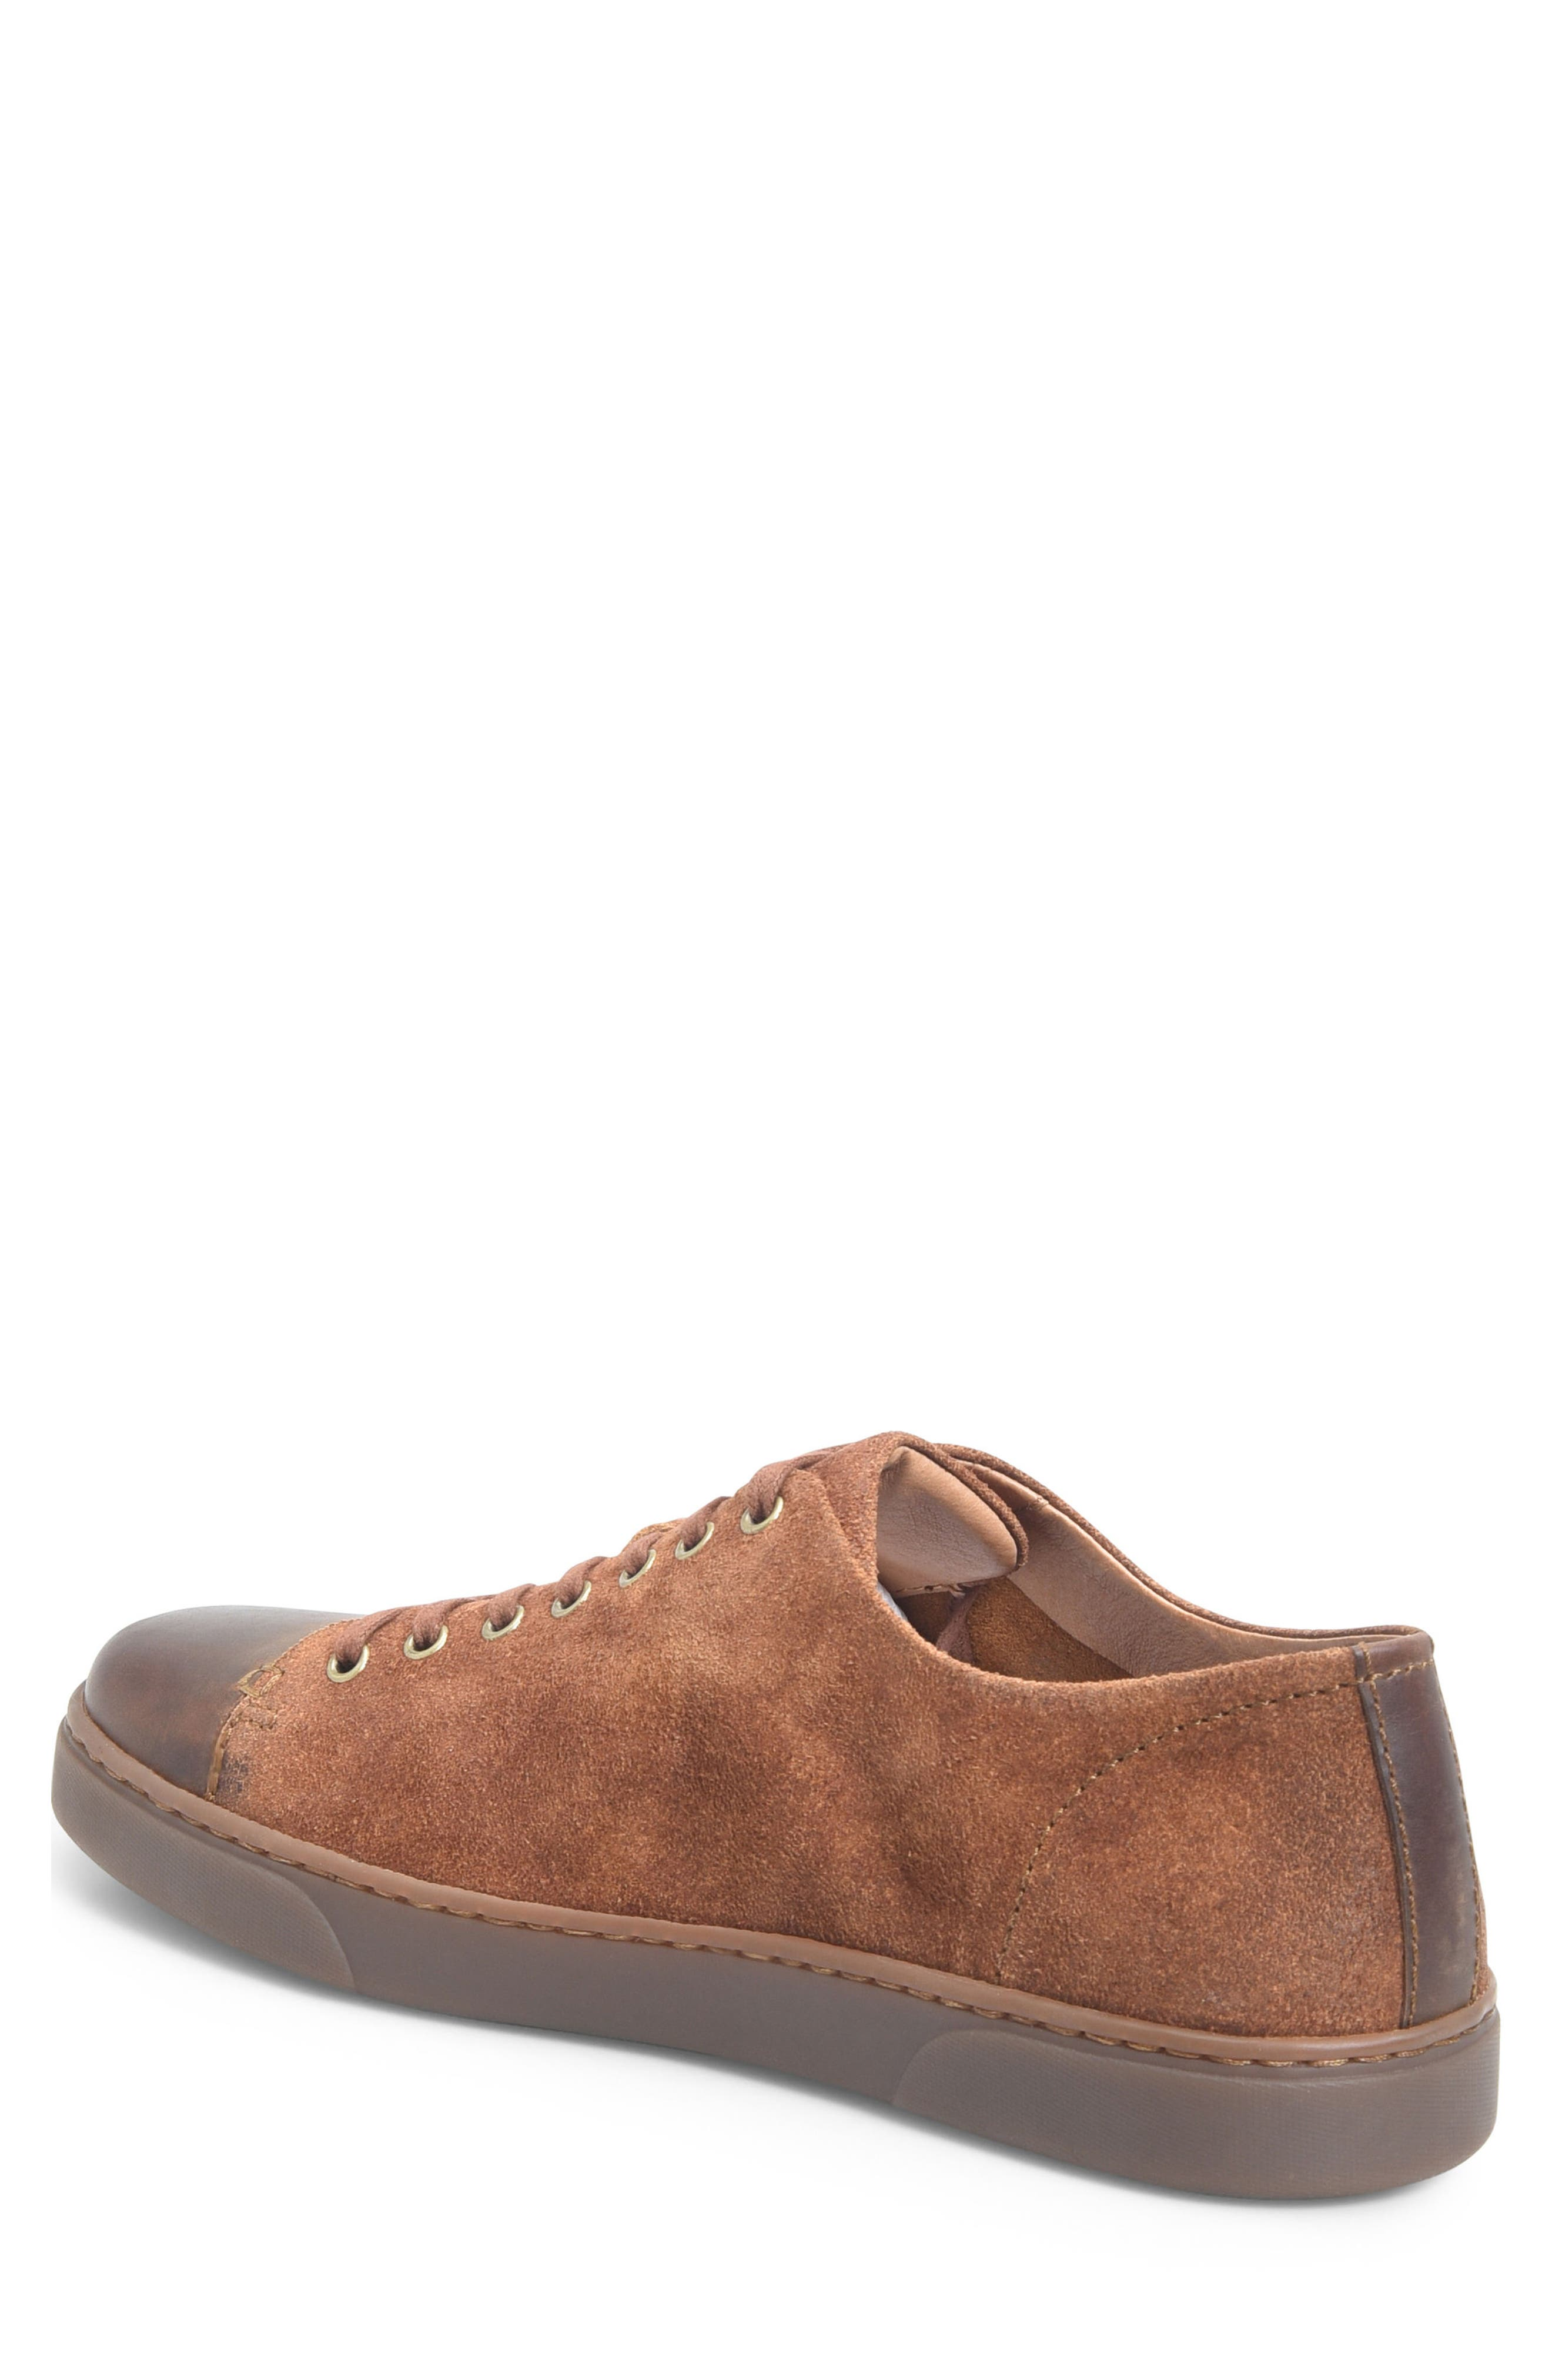 'Bayne' Cap Toe Sneaker,                             Alternate thumbnail 15, color,